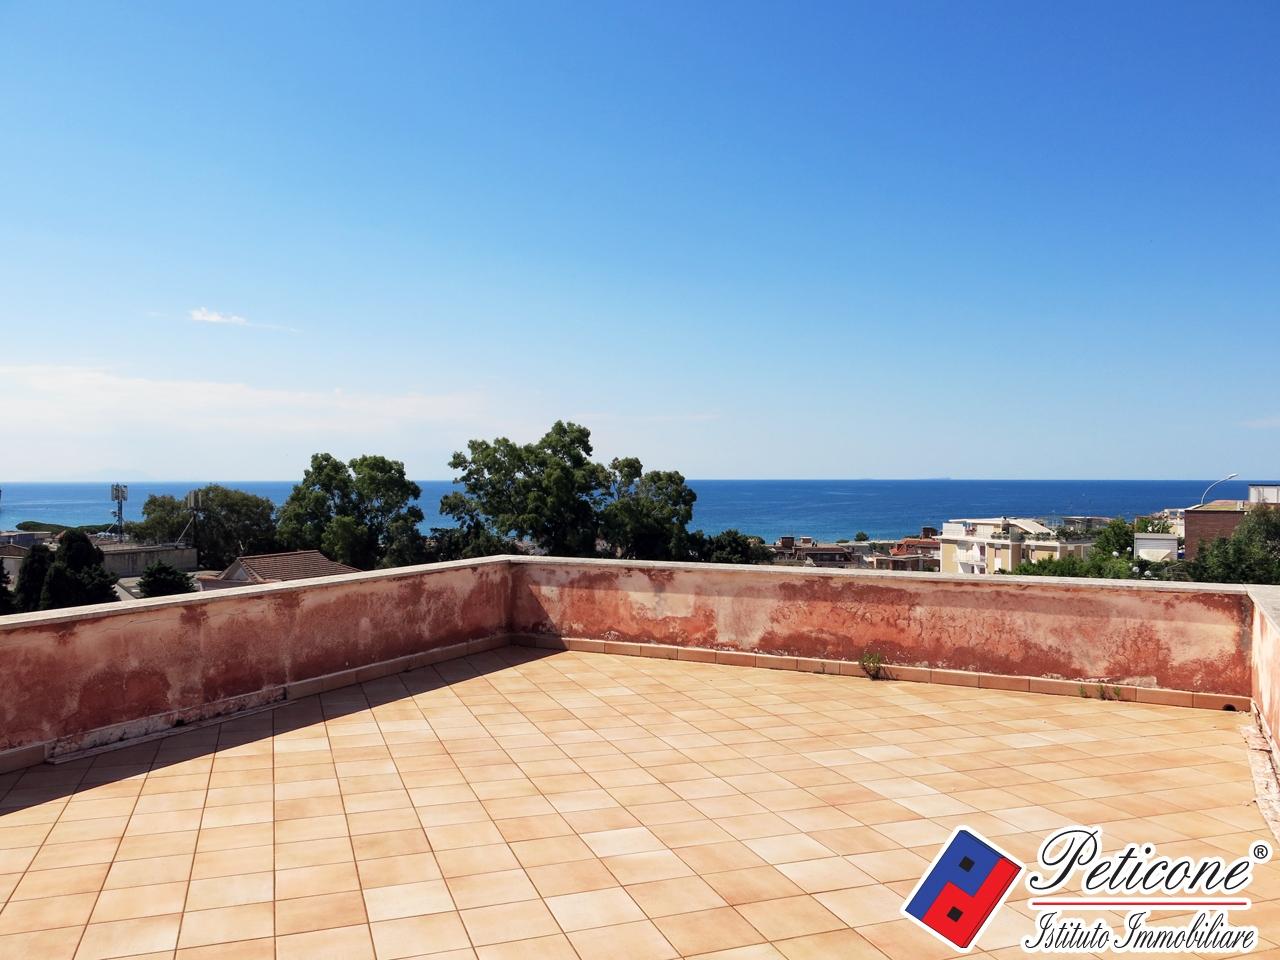 Villa in Vendita a Gaeta: 5 locali, 250 mq - Foto 2